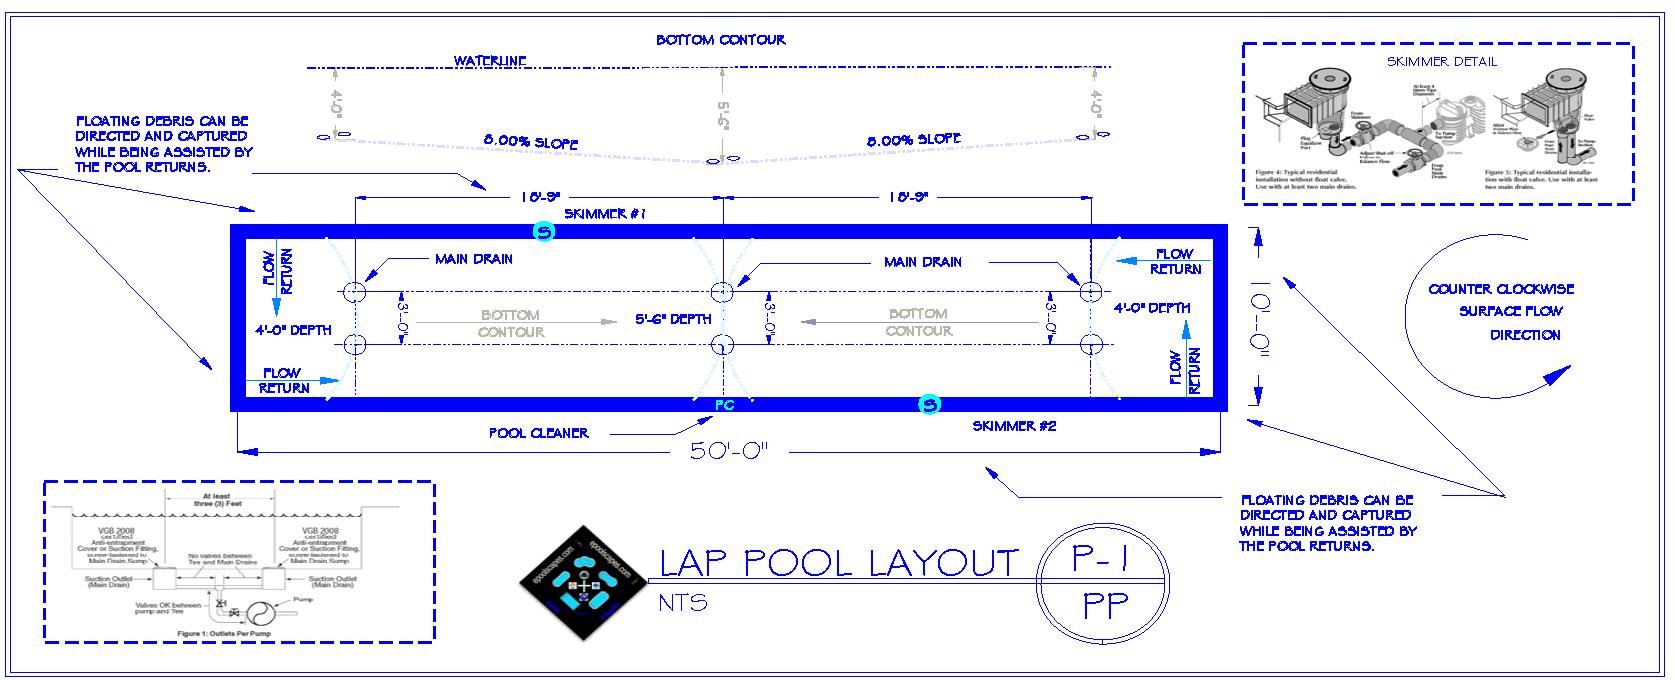 D Lap Pool Bottom Contour Png 1675 680 Lap Pool Lap Pool Cost